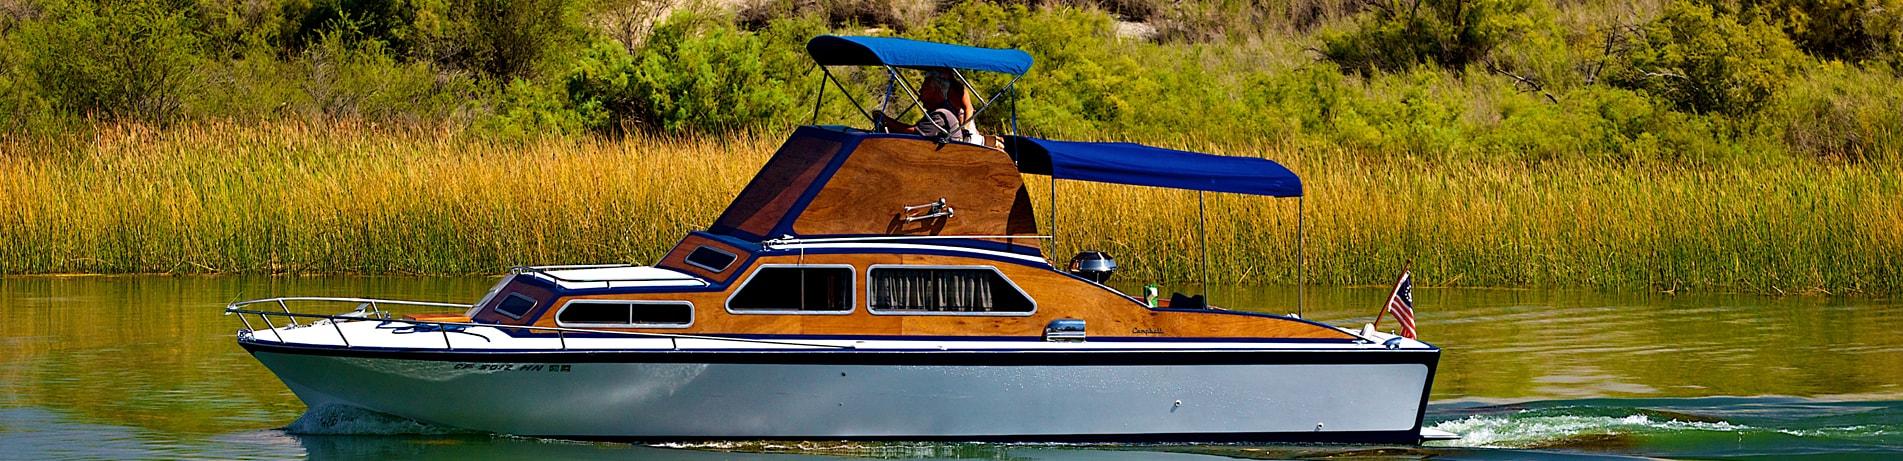 blue-boat-2-min